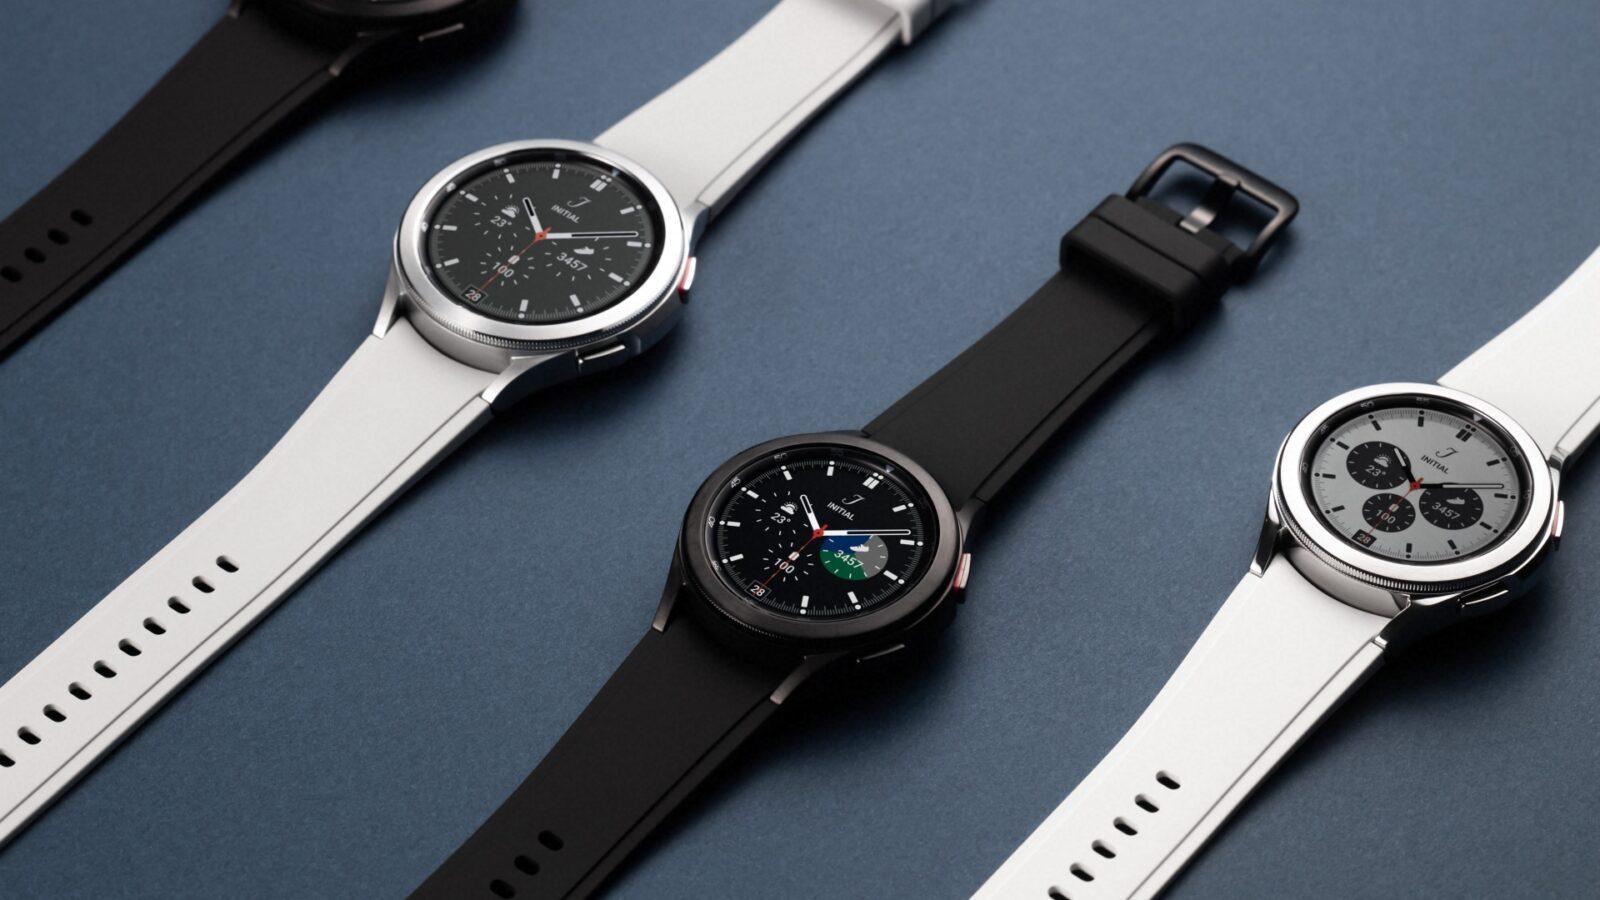 Samsung анонсировала новые часы Galaxy Watch 4 и Watch 4 Classic на Wear OS официально (galaxy watch 4 classic 4)